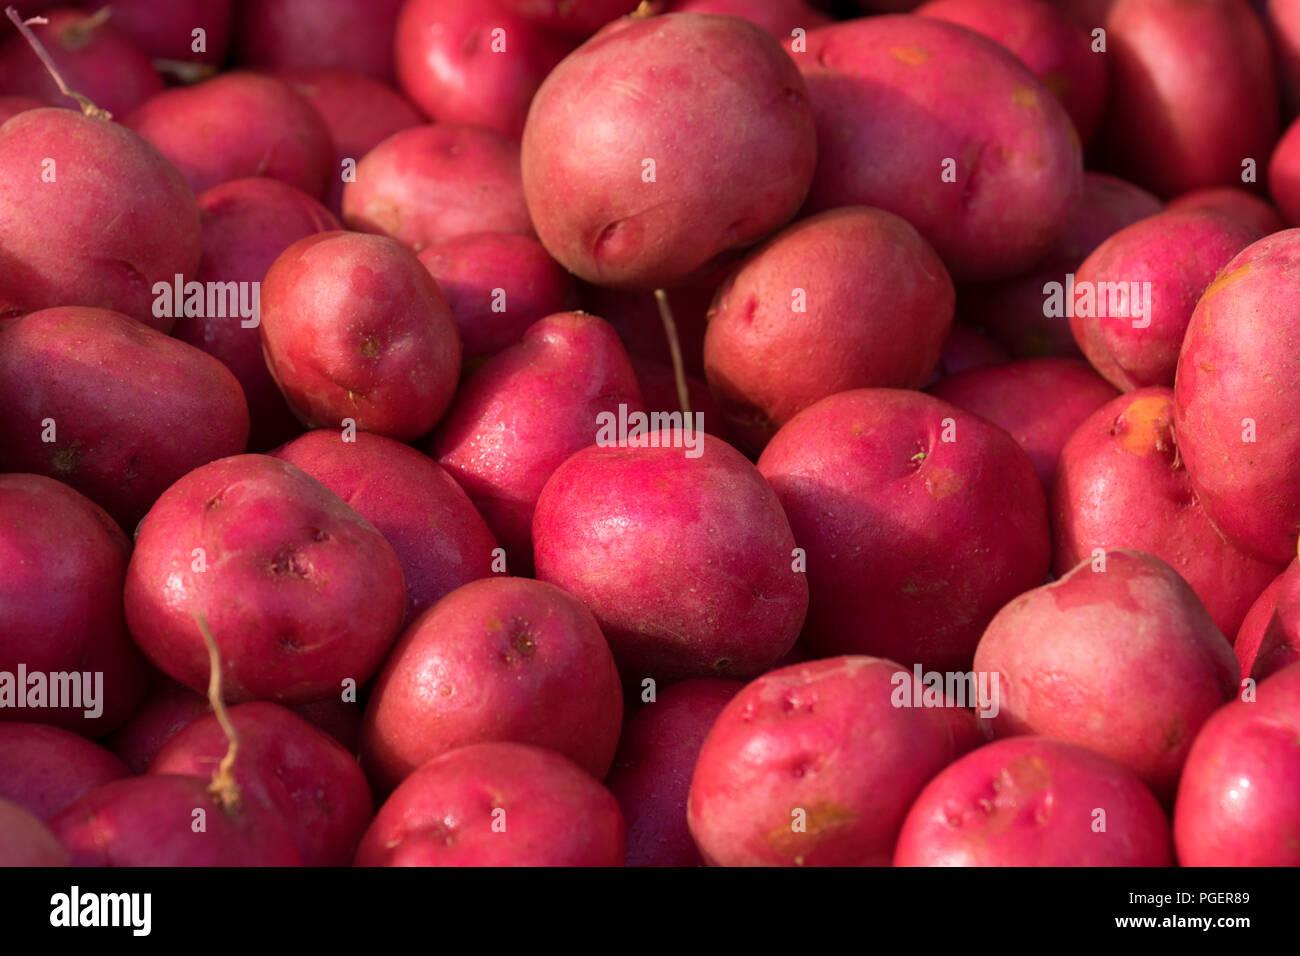 Red potatoes, Salem Saturday Marker, Salem, Oregon - Stock Image